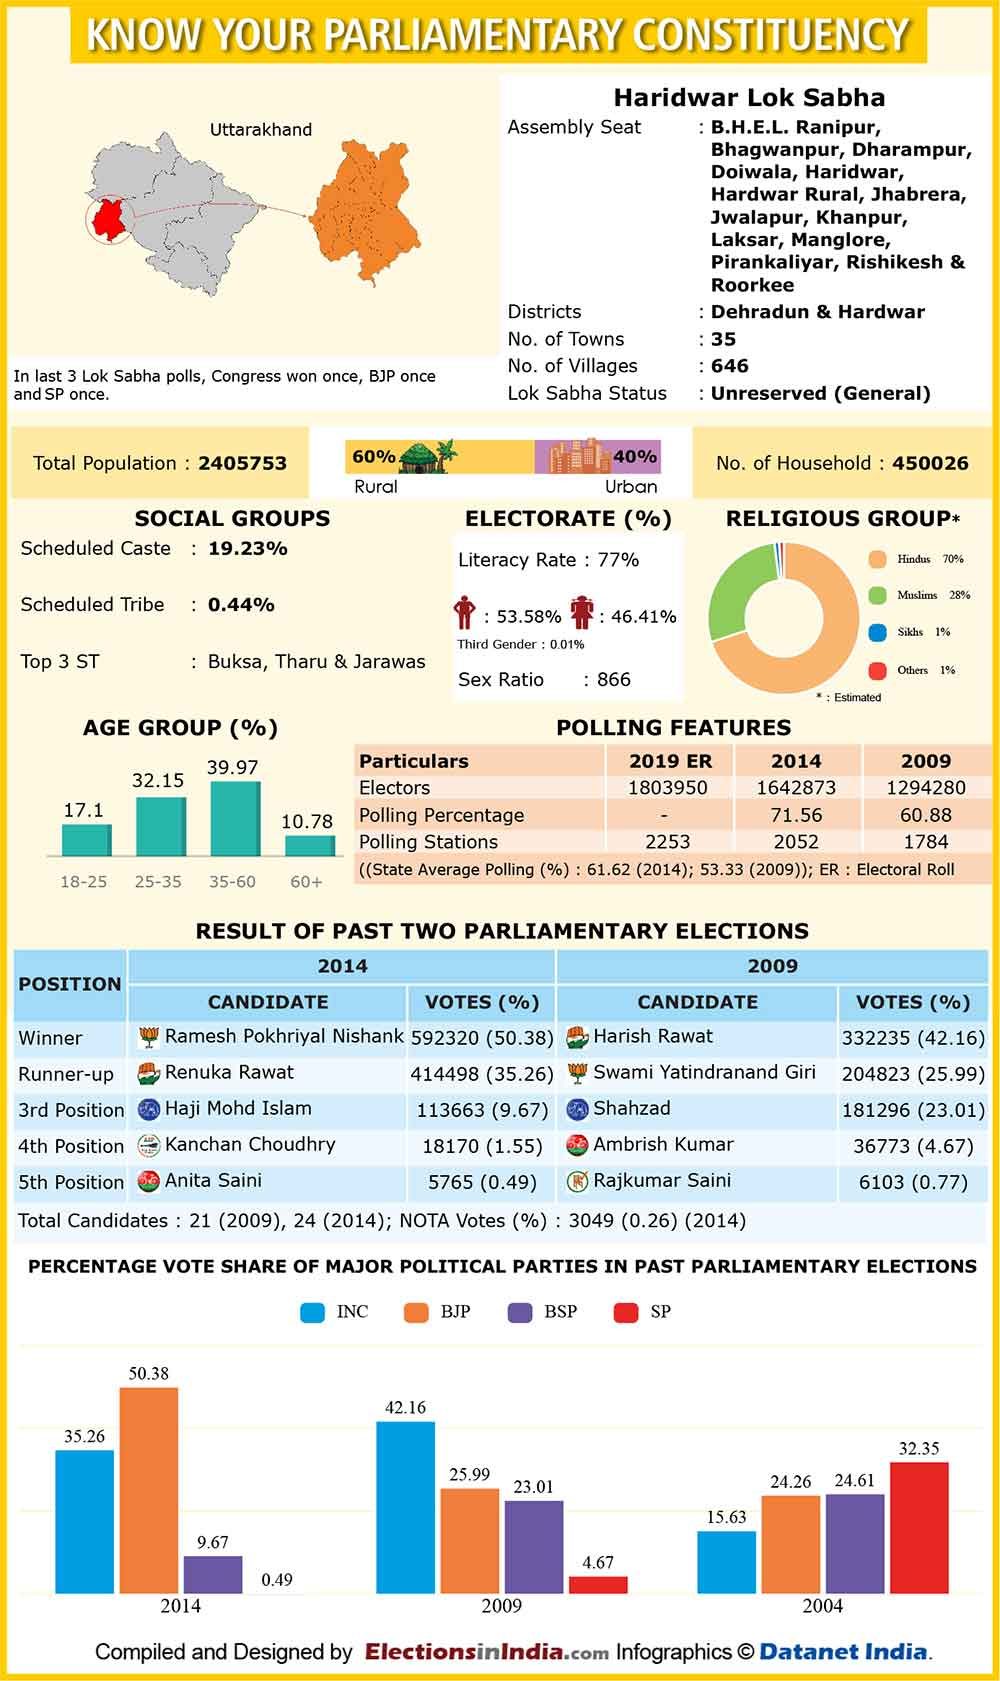 Haridwar Lok Sabha Constituency Profile